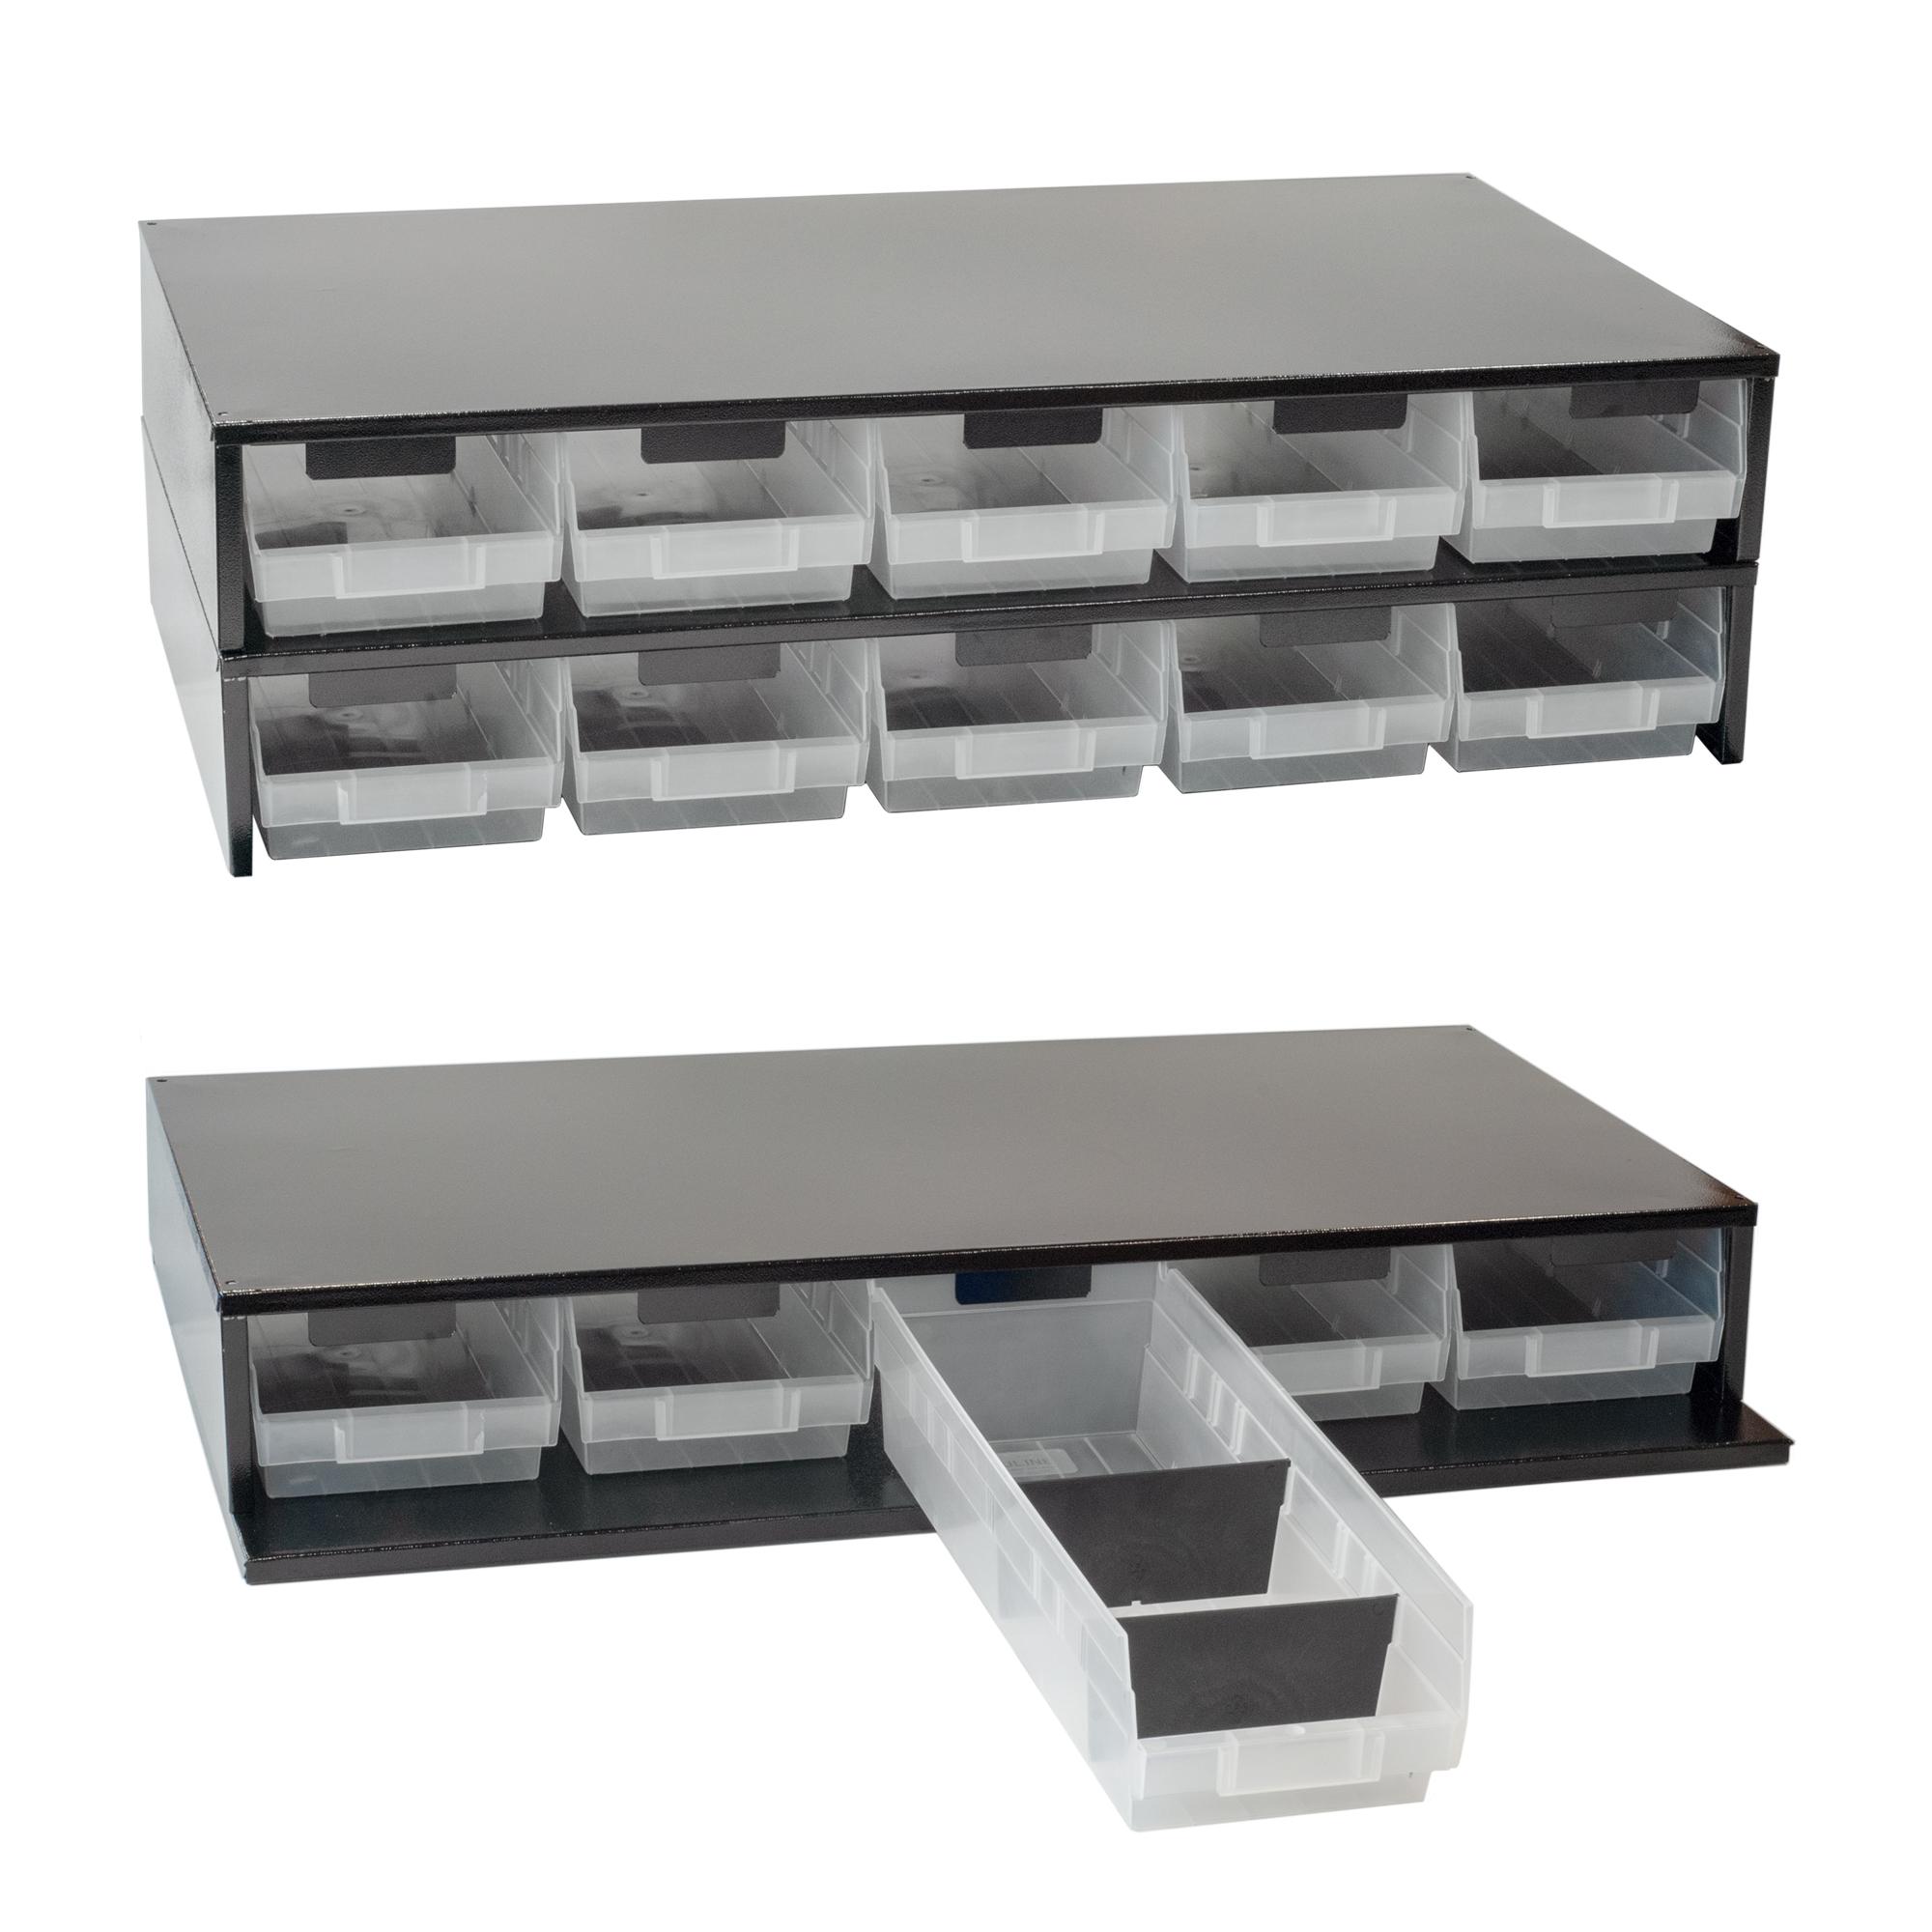 Craftline Storage System | Made In USA | Large Modular Stackable Bin Cabinet